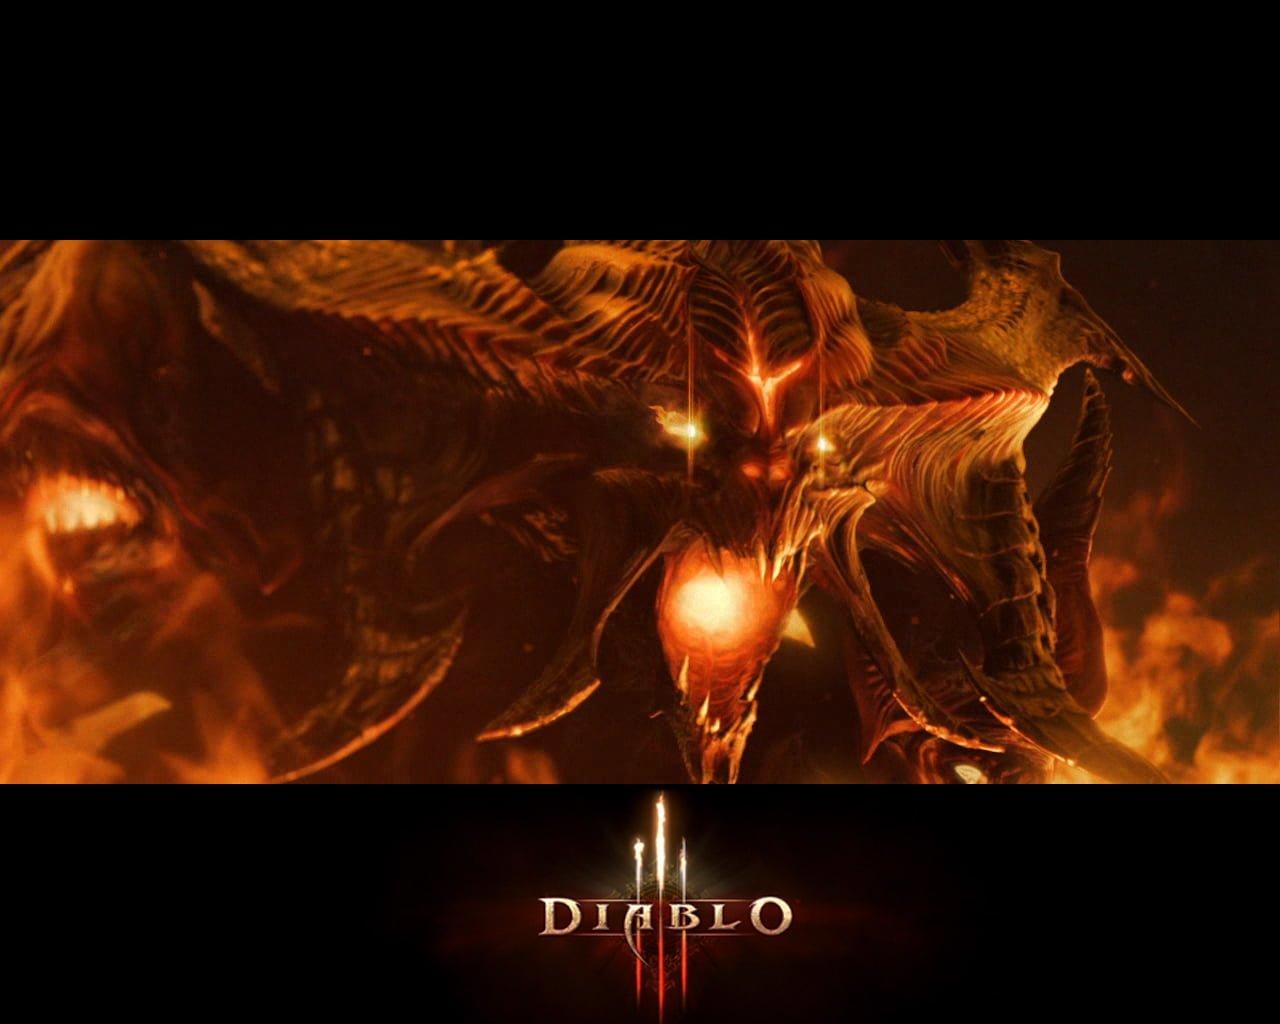 diablo_3_wallpaper_large